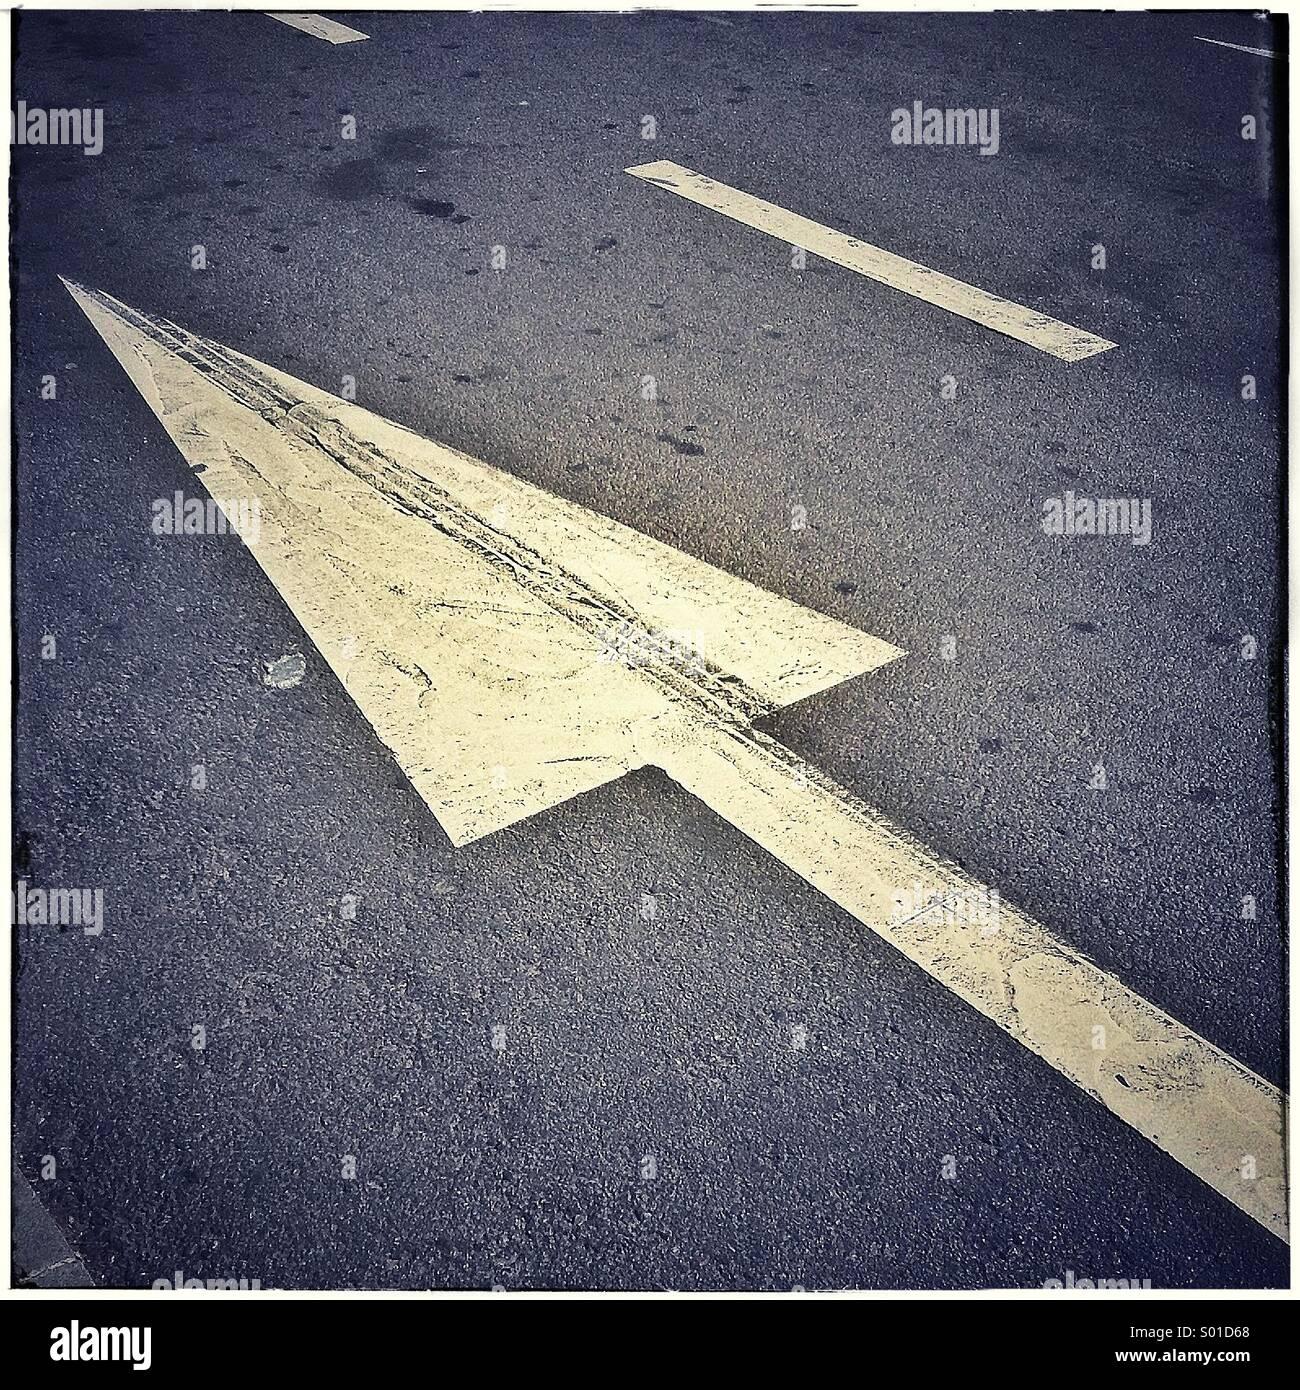 Arrow on asphalt road, one direction traffic signStock Photo